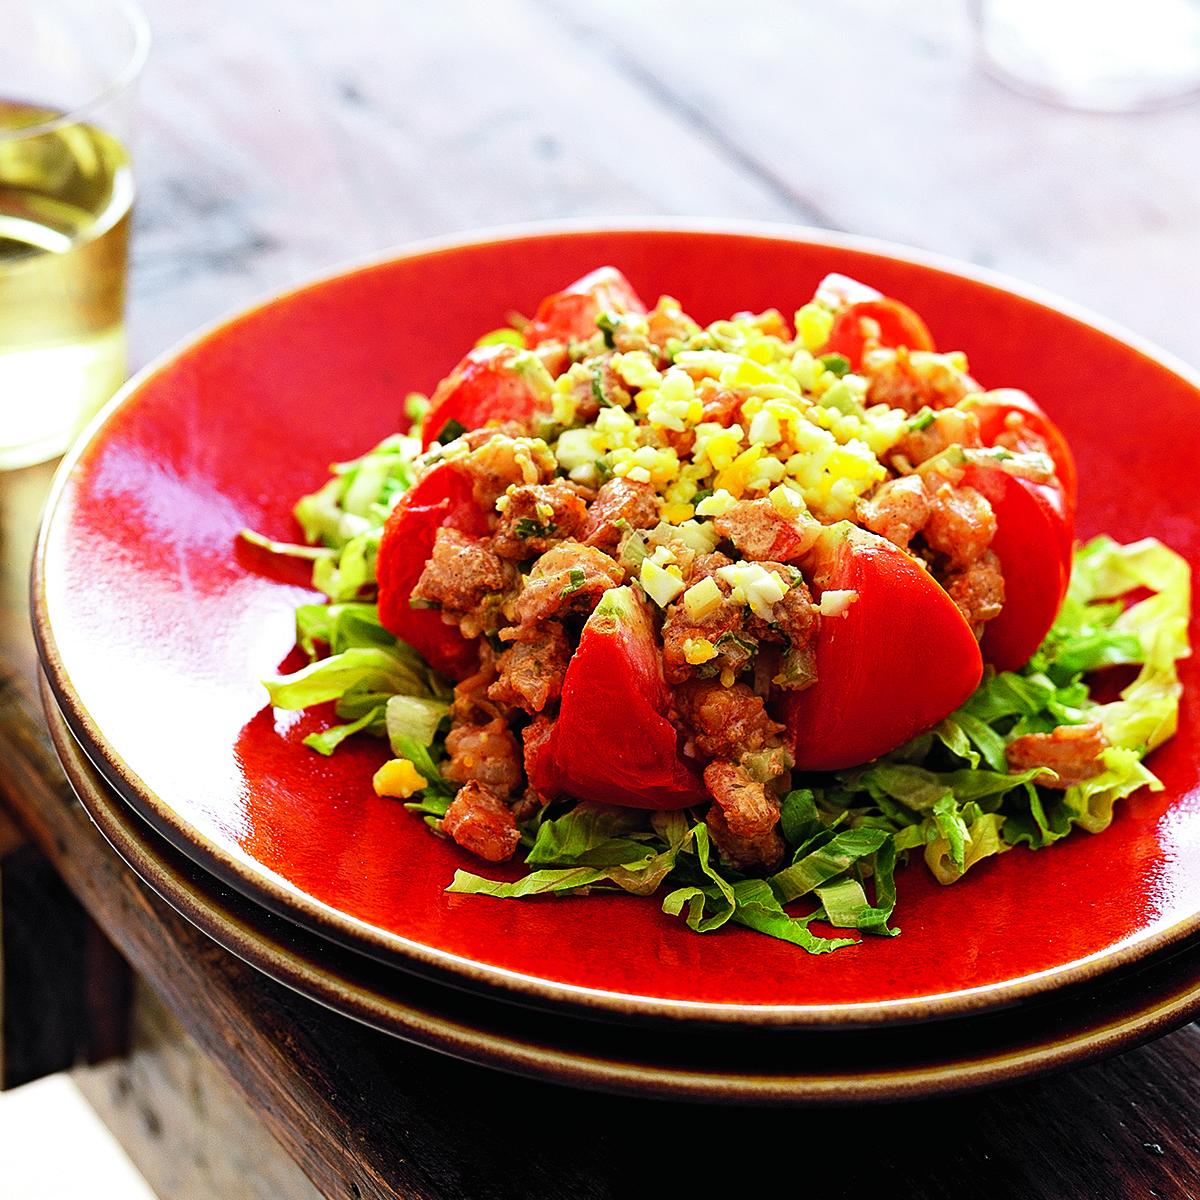 Shrimp-Stuffed Tomatoes